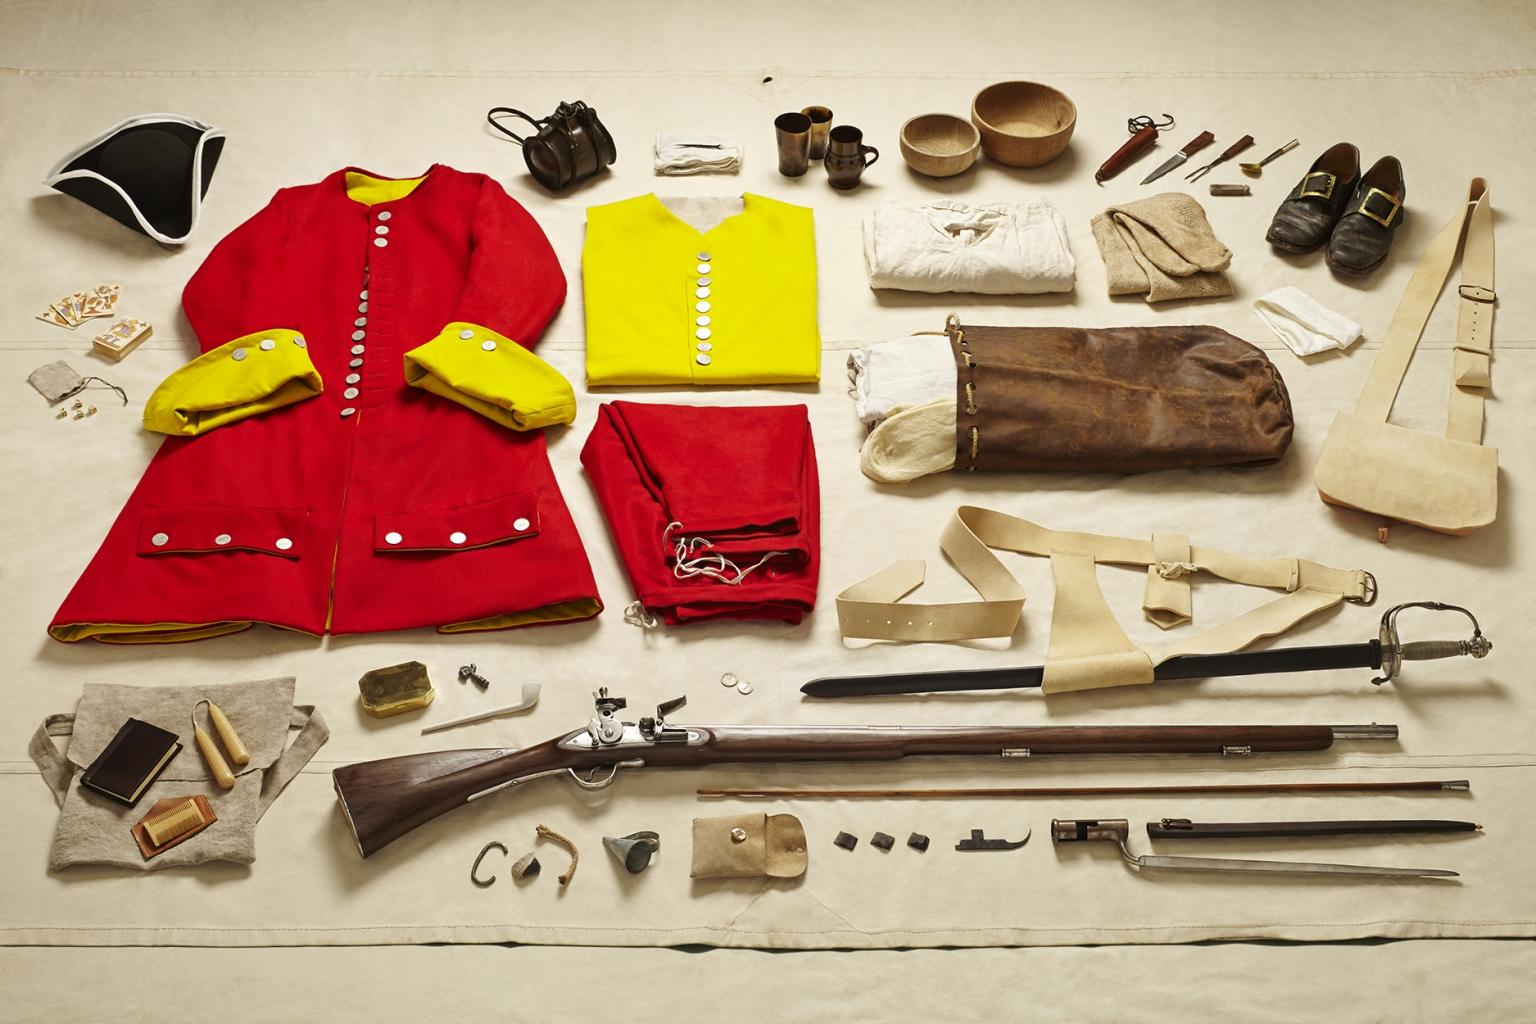 Private Sentinel, Battle of Malplaquet, 1709 - Soldiers' Inventories - Photo by Thom Atkinson